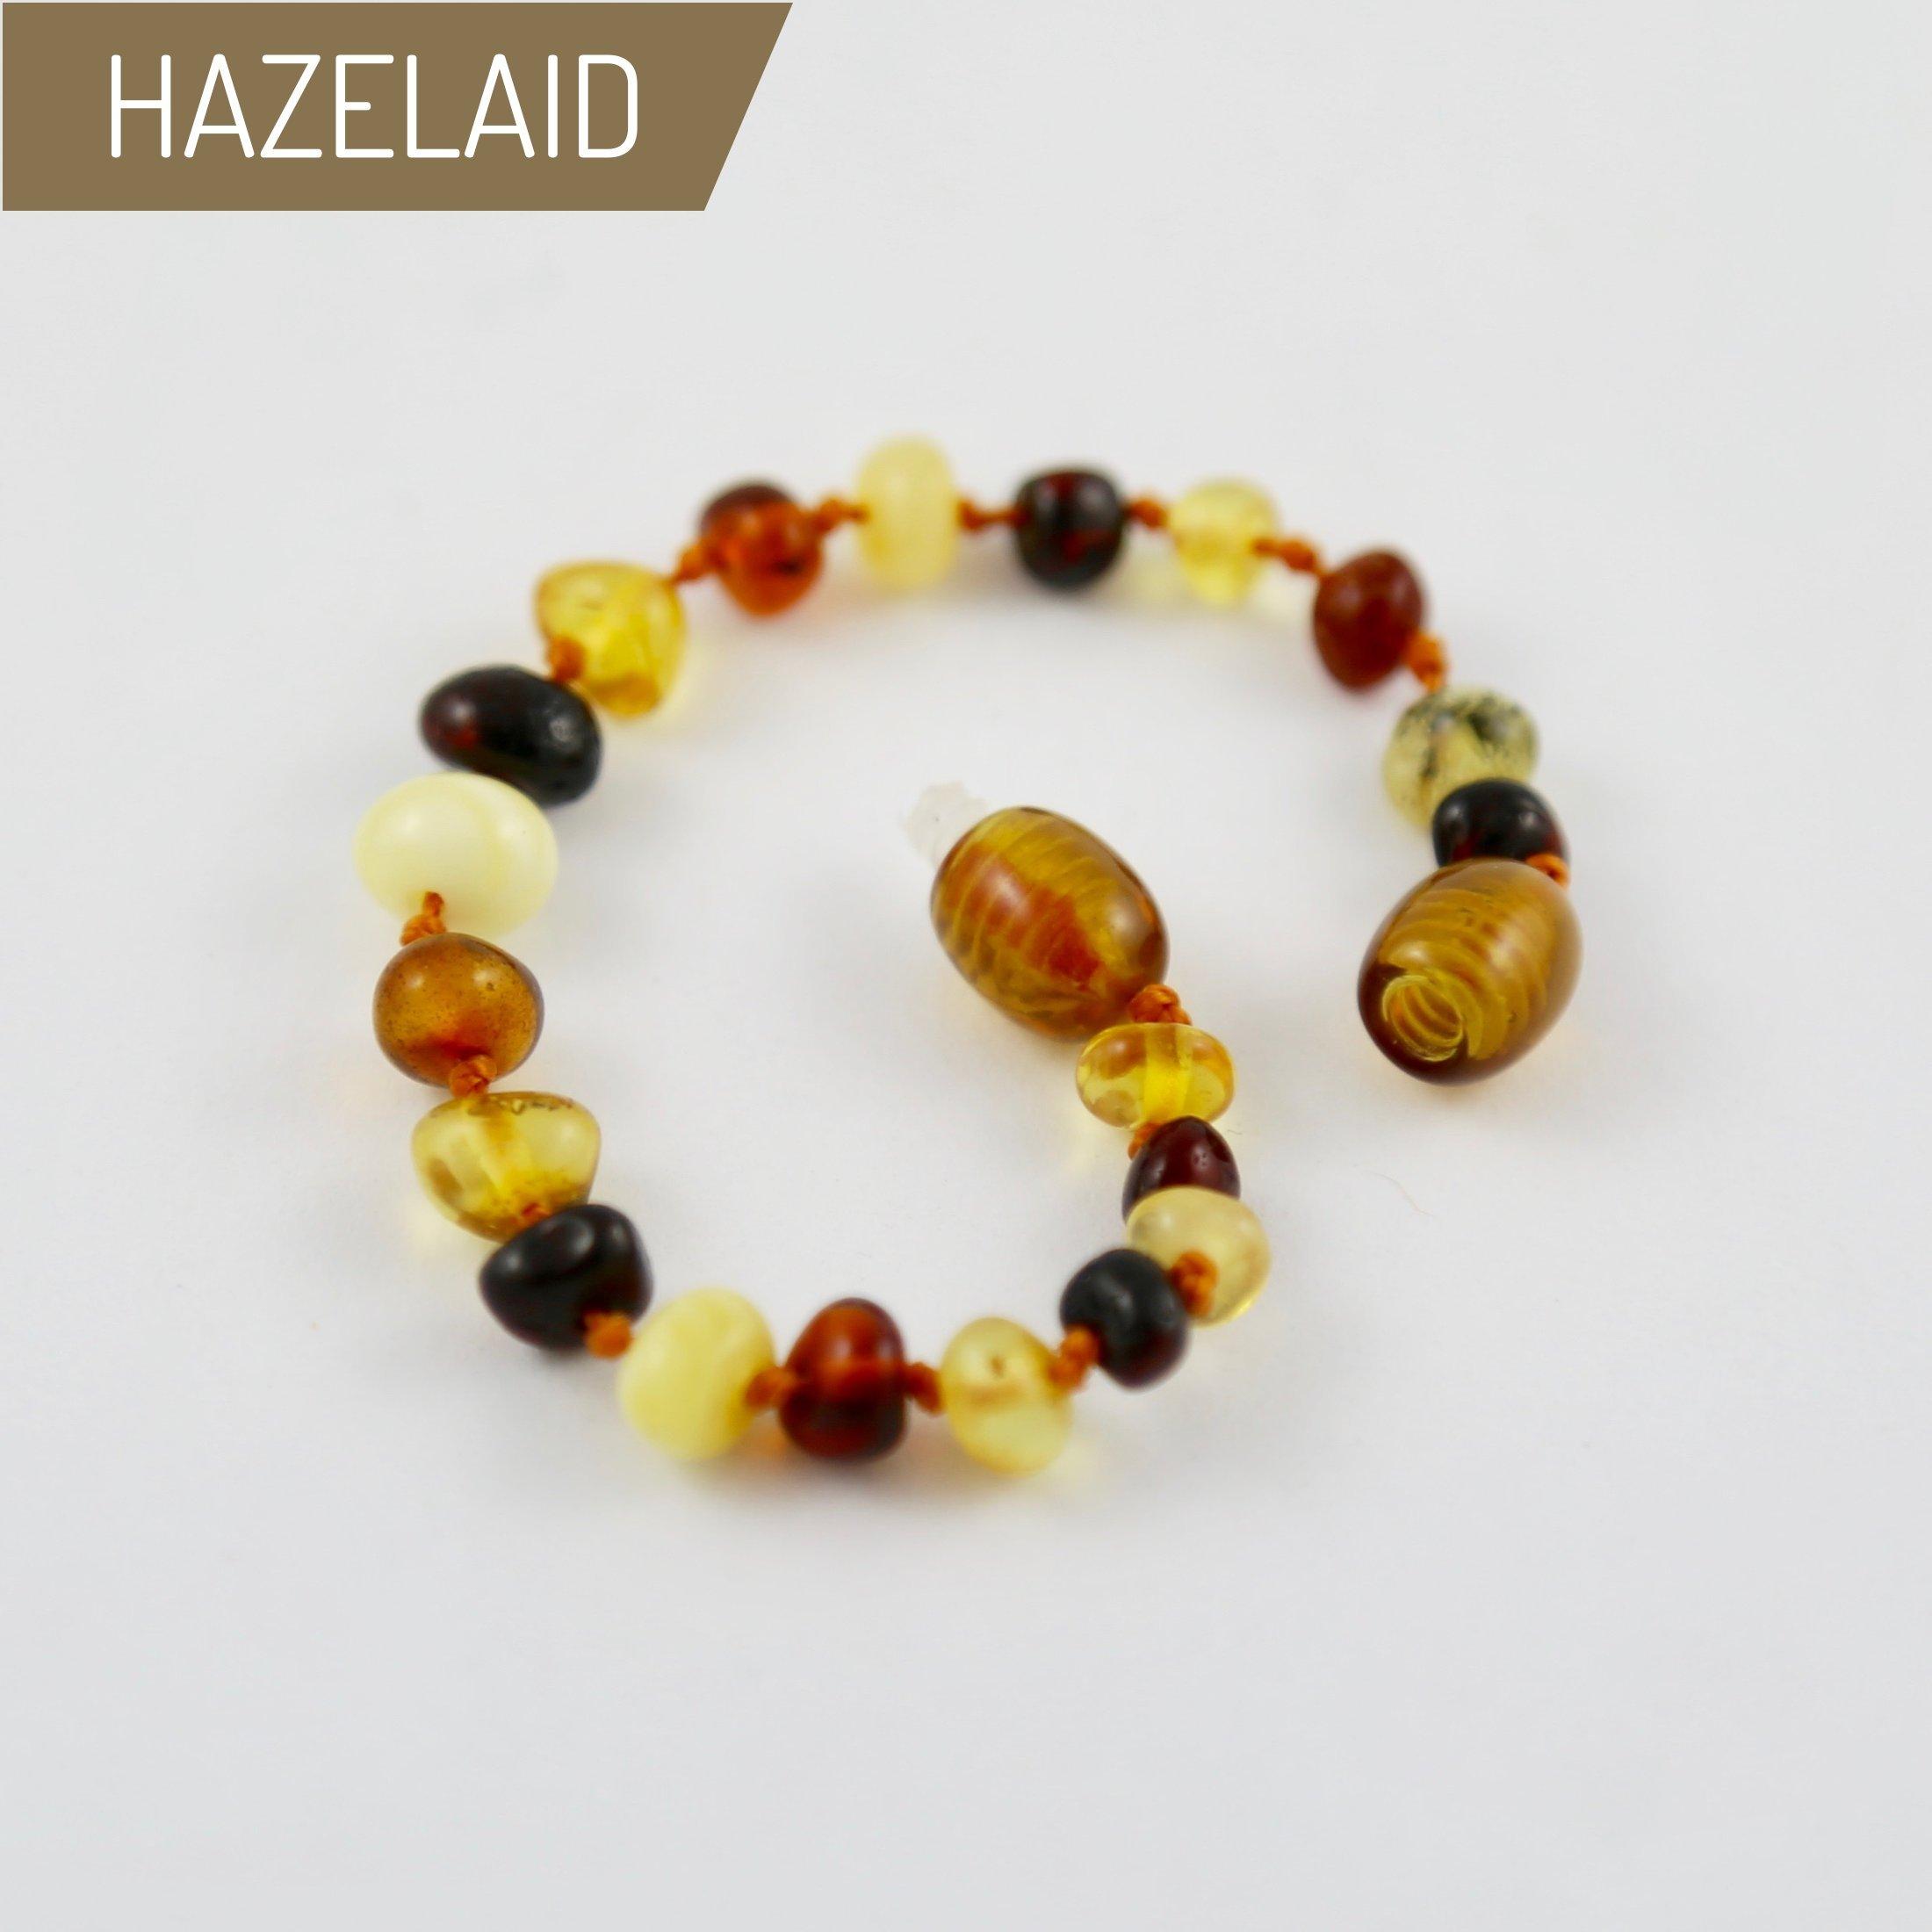 Hazelaid (TM) 5.5'' Baltic Amber Multicolored Round Bracelet